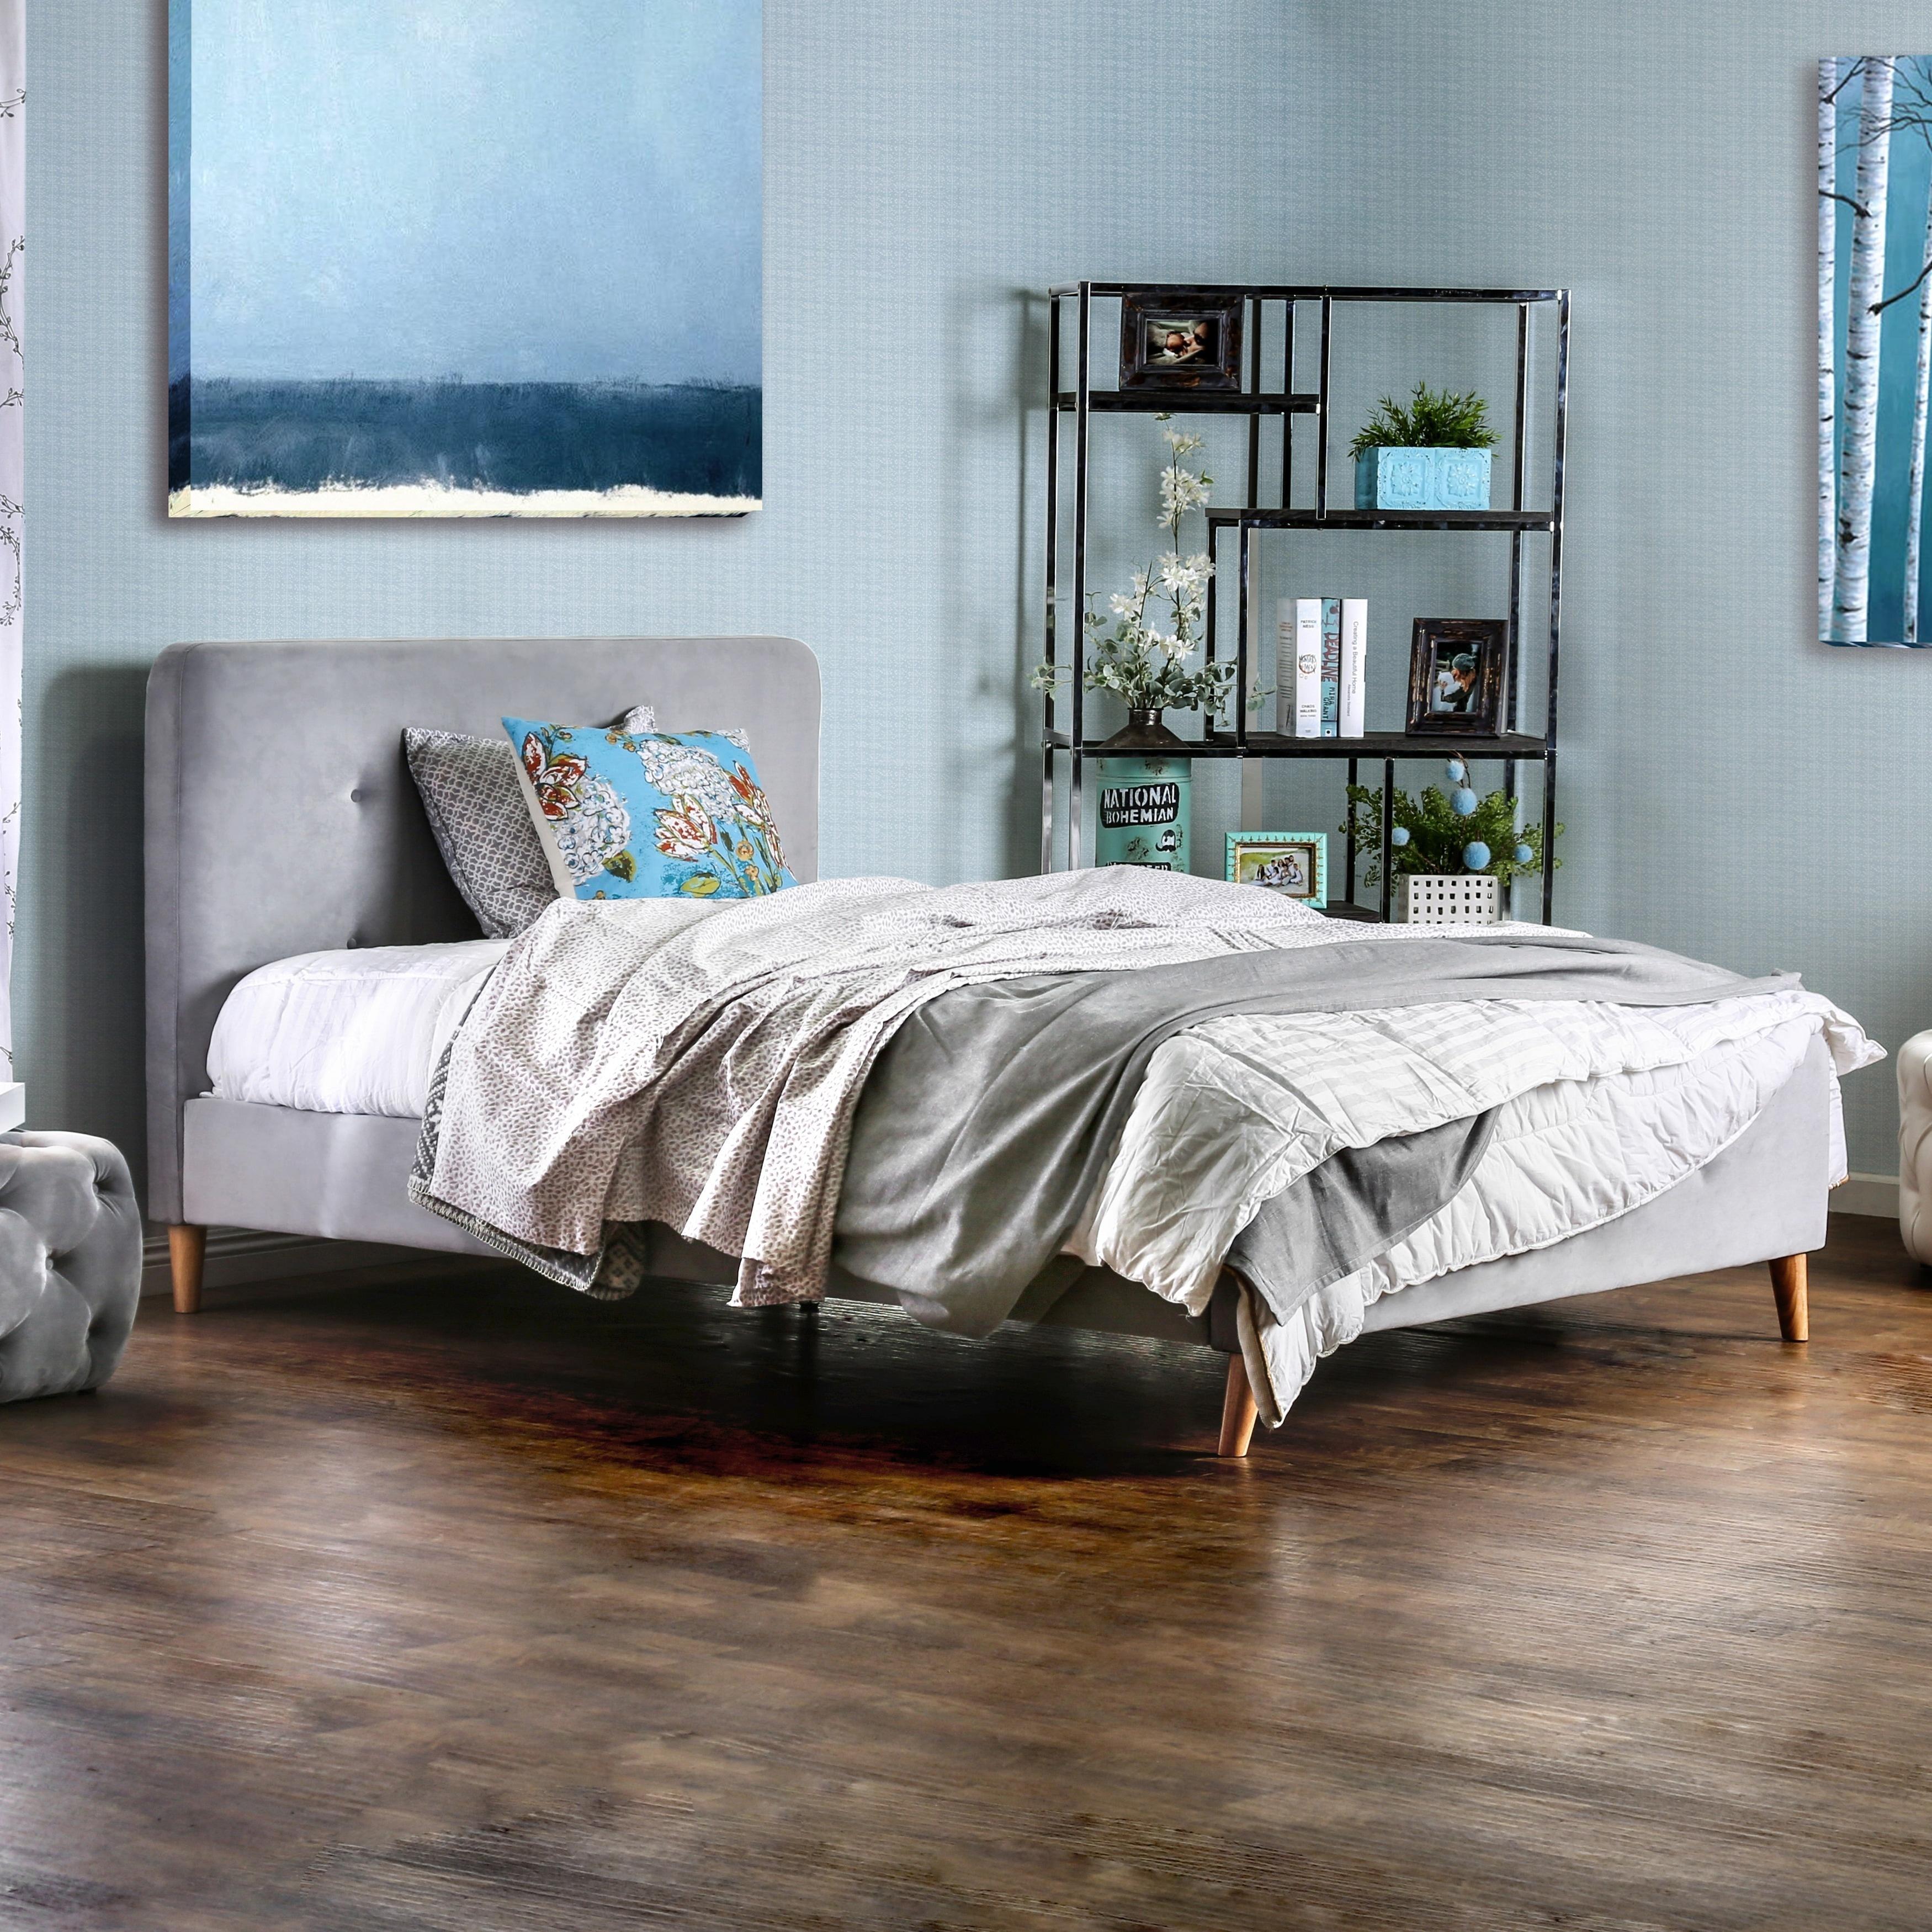 Shop Furniture of America Celene Mid-century Modern Tufted Full Bed ...